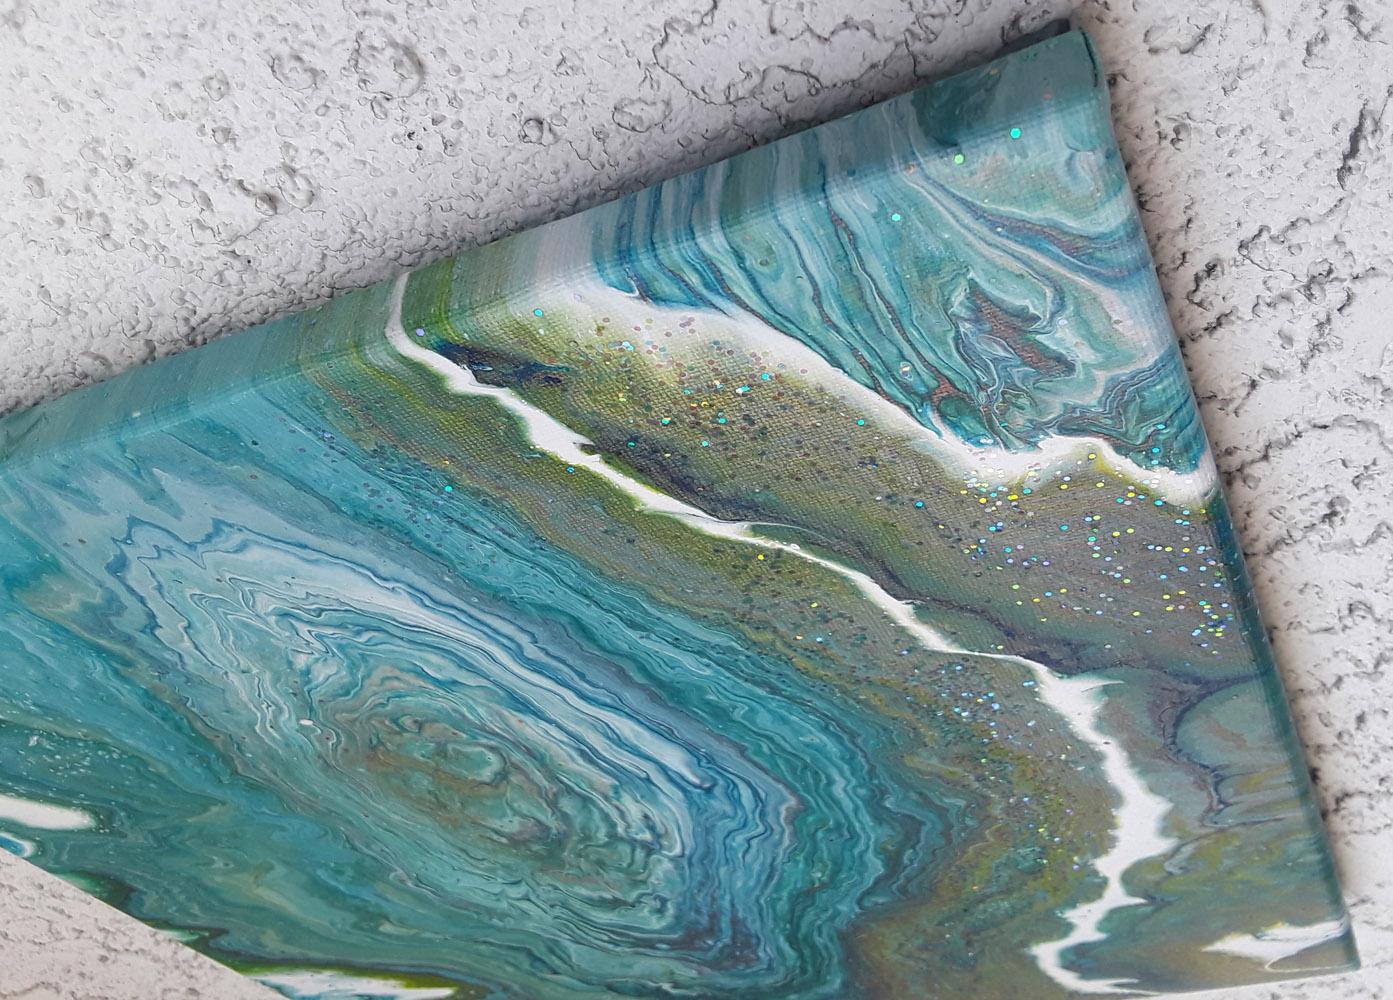 61 Glitter Lake | Pintura Acrílica Fluida, Abstracta Y Conceptual